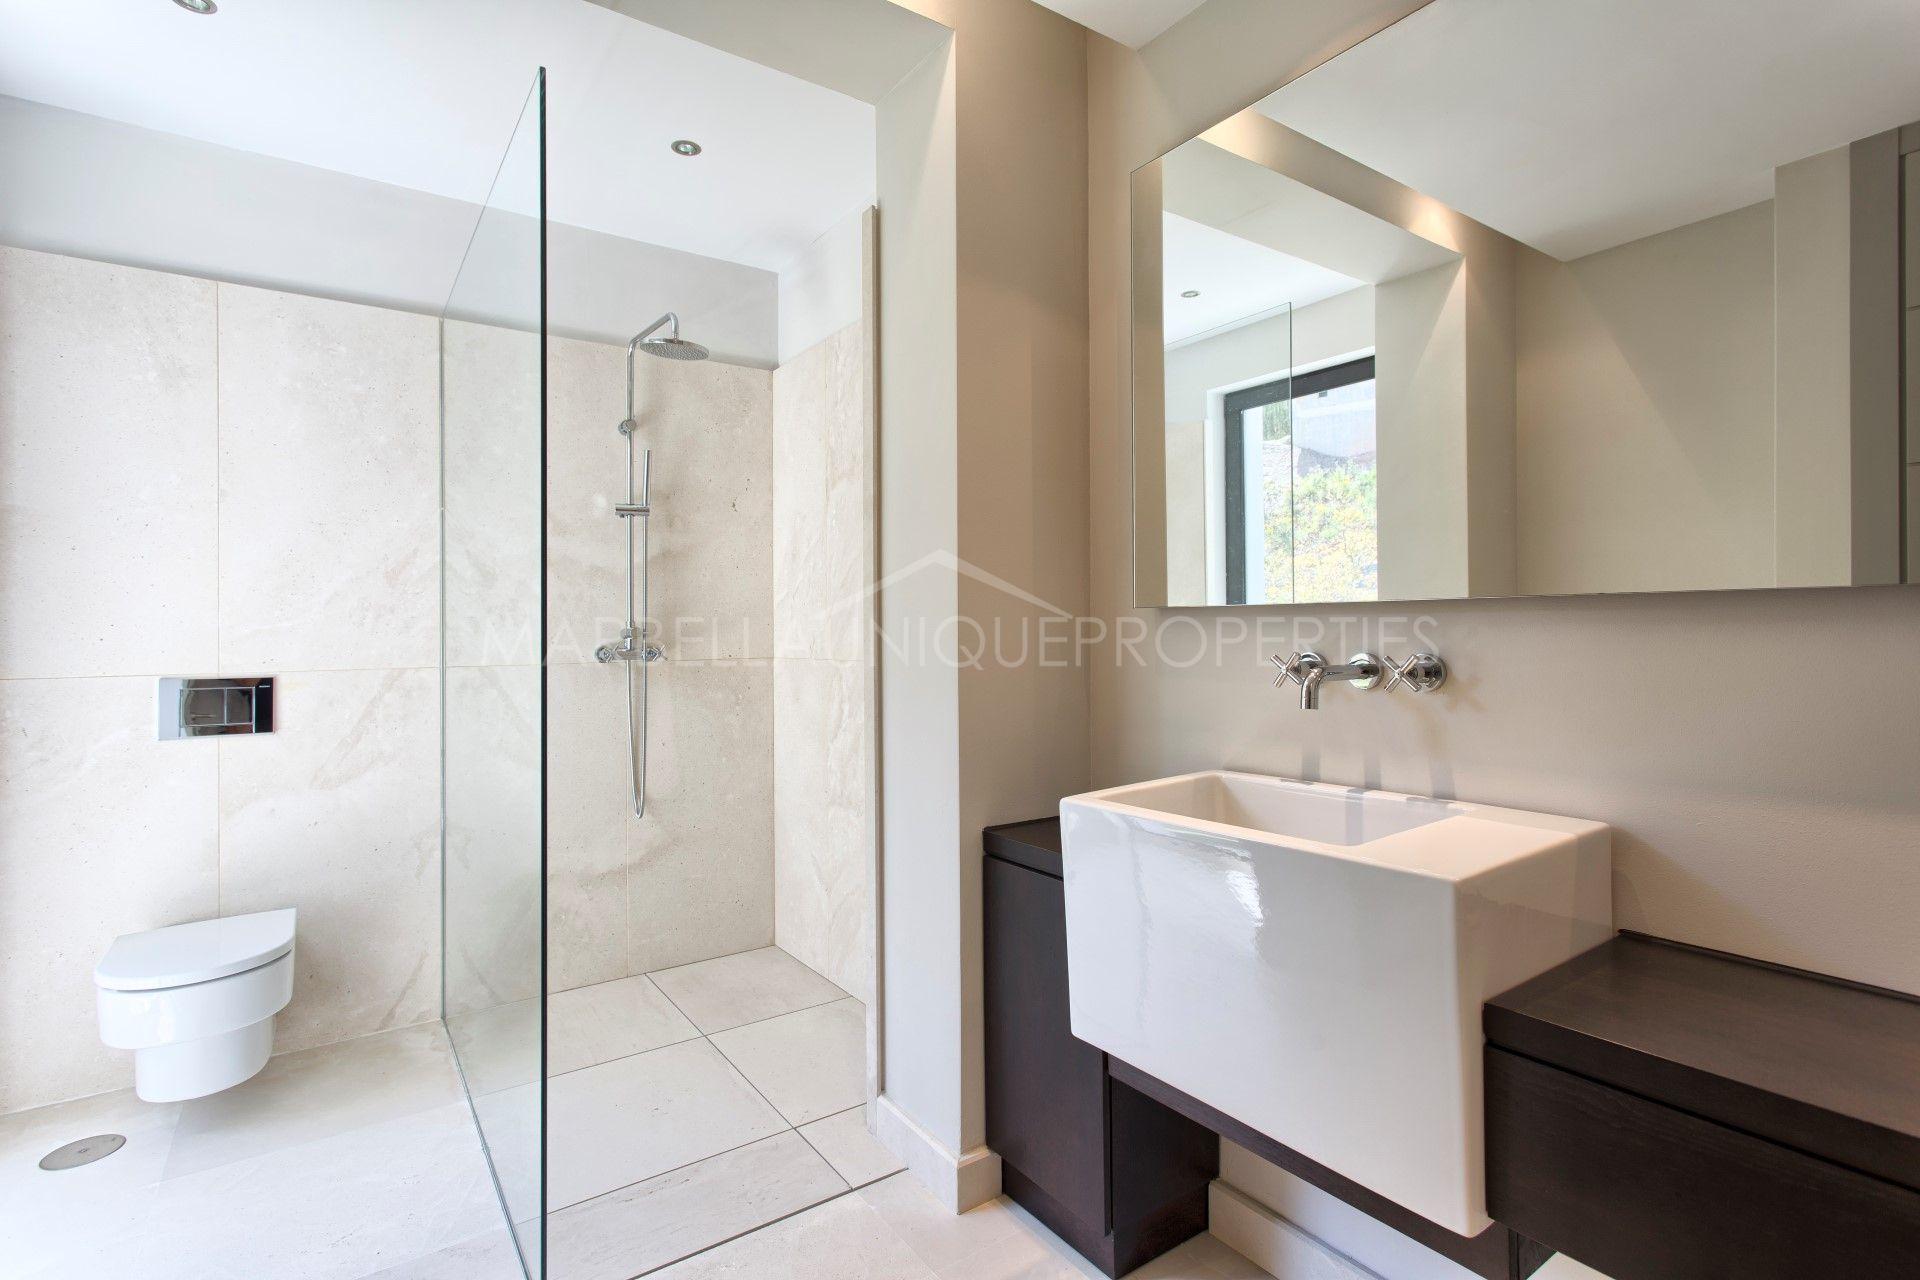 A luxurious current 6 bedroom villa in Los Arqueros Golf resort